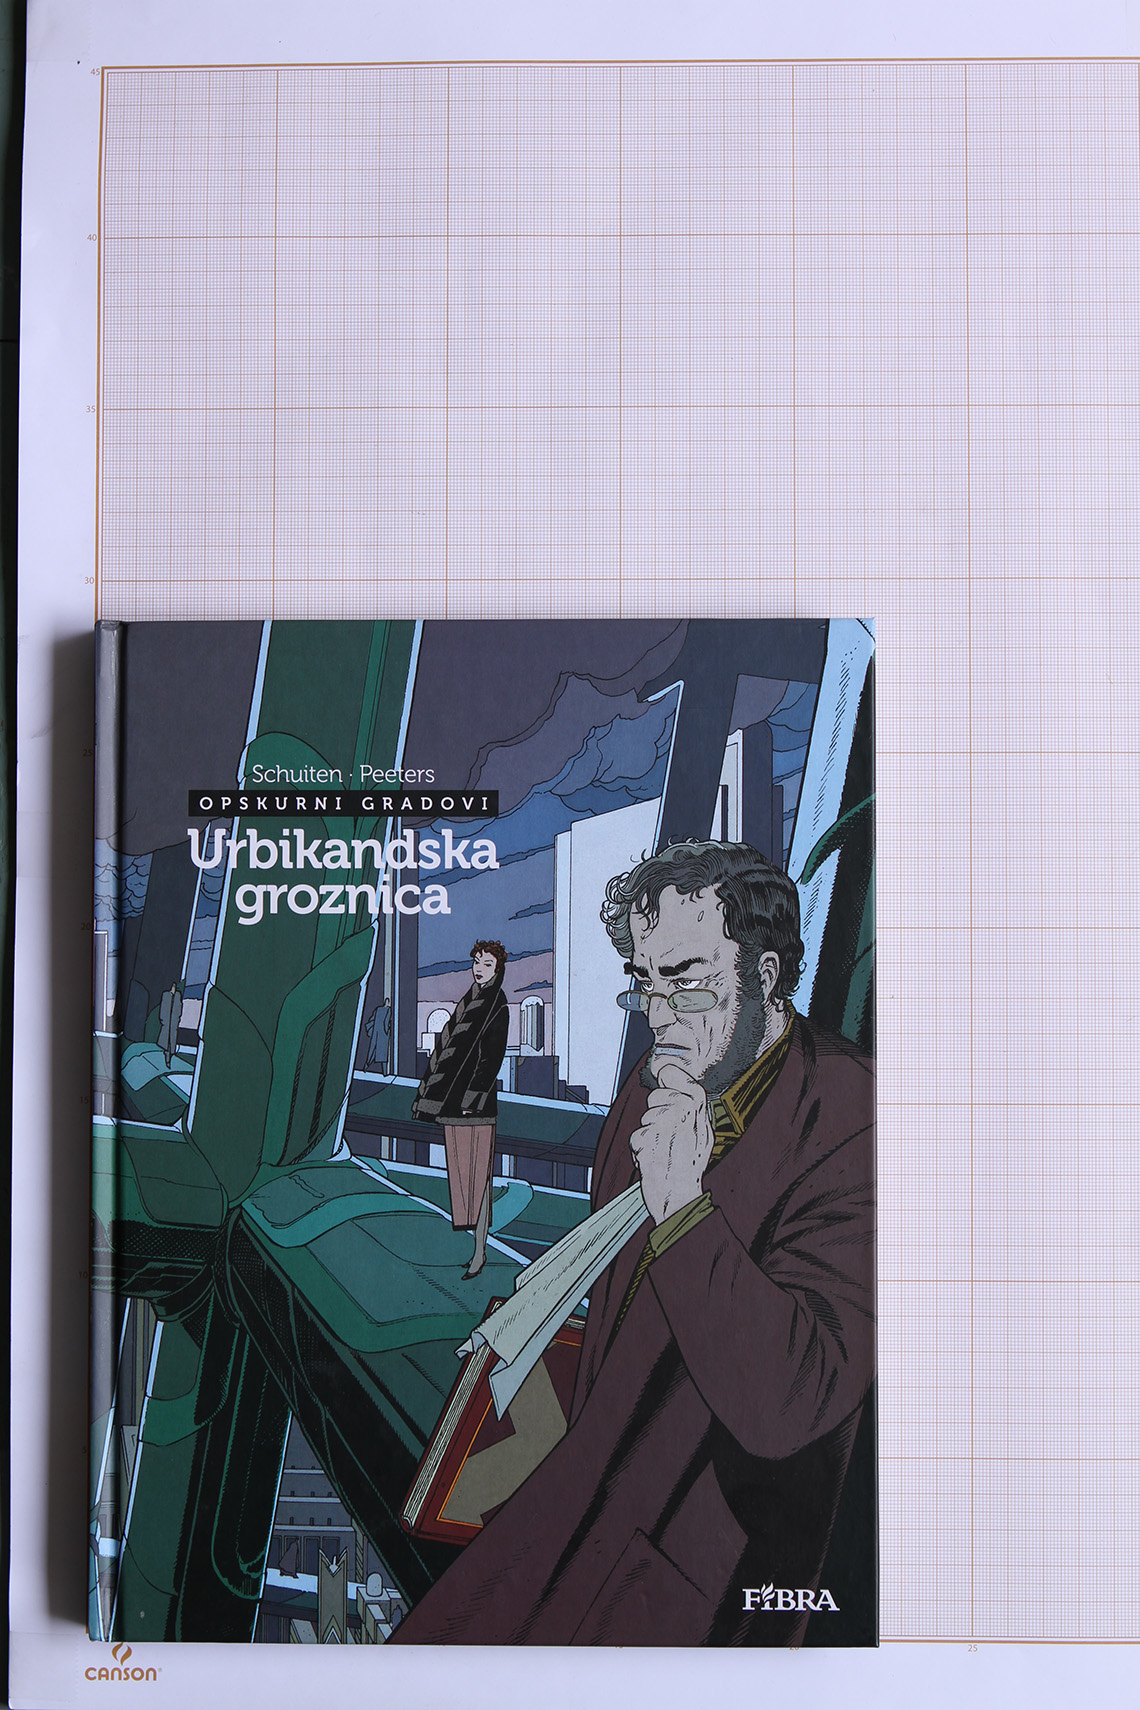 Urbikandska groznica, F.Schuiten & B.Peeters - Fibra© Maison Autrique, 2011